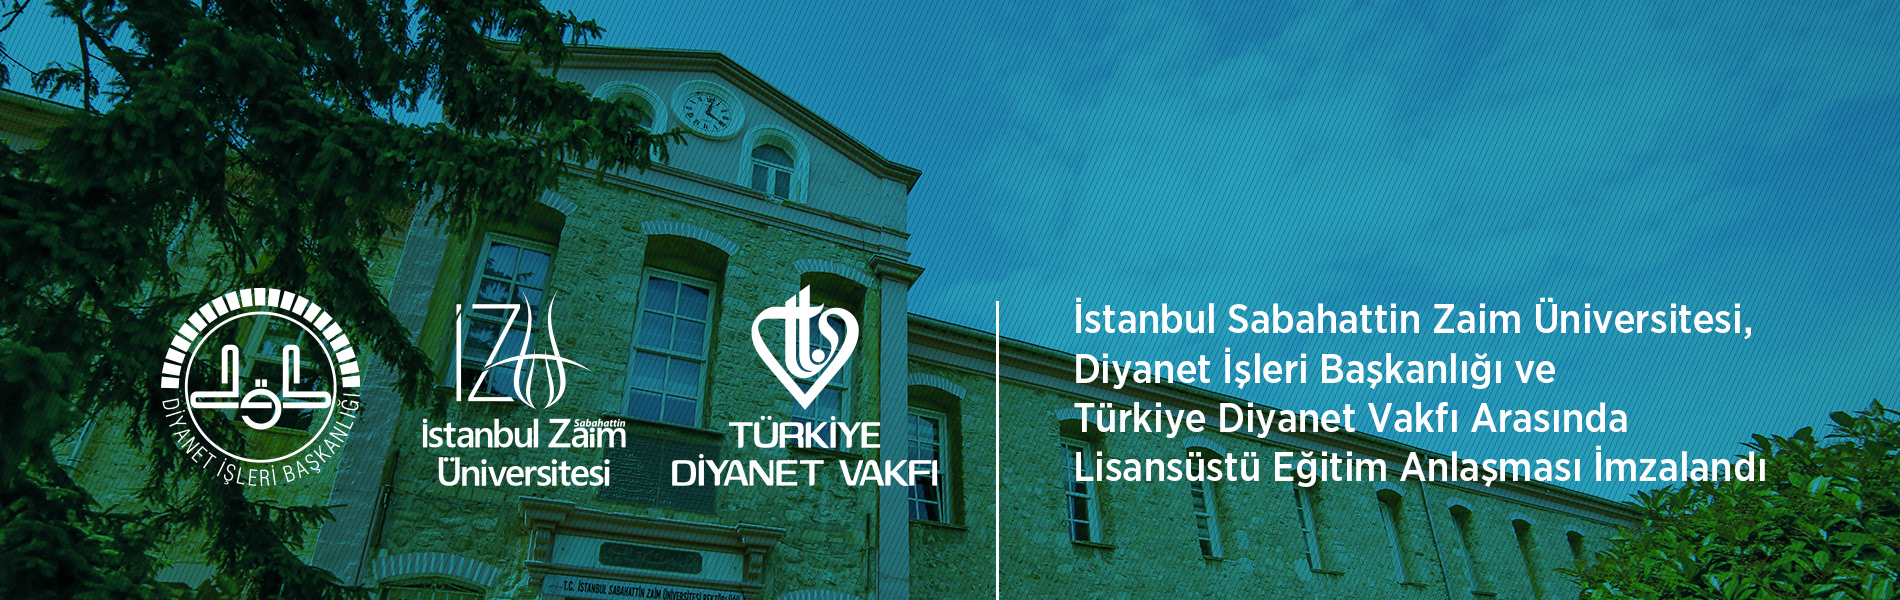 DIYANET-19X6